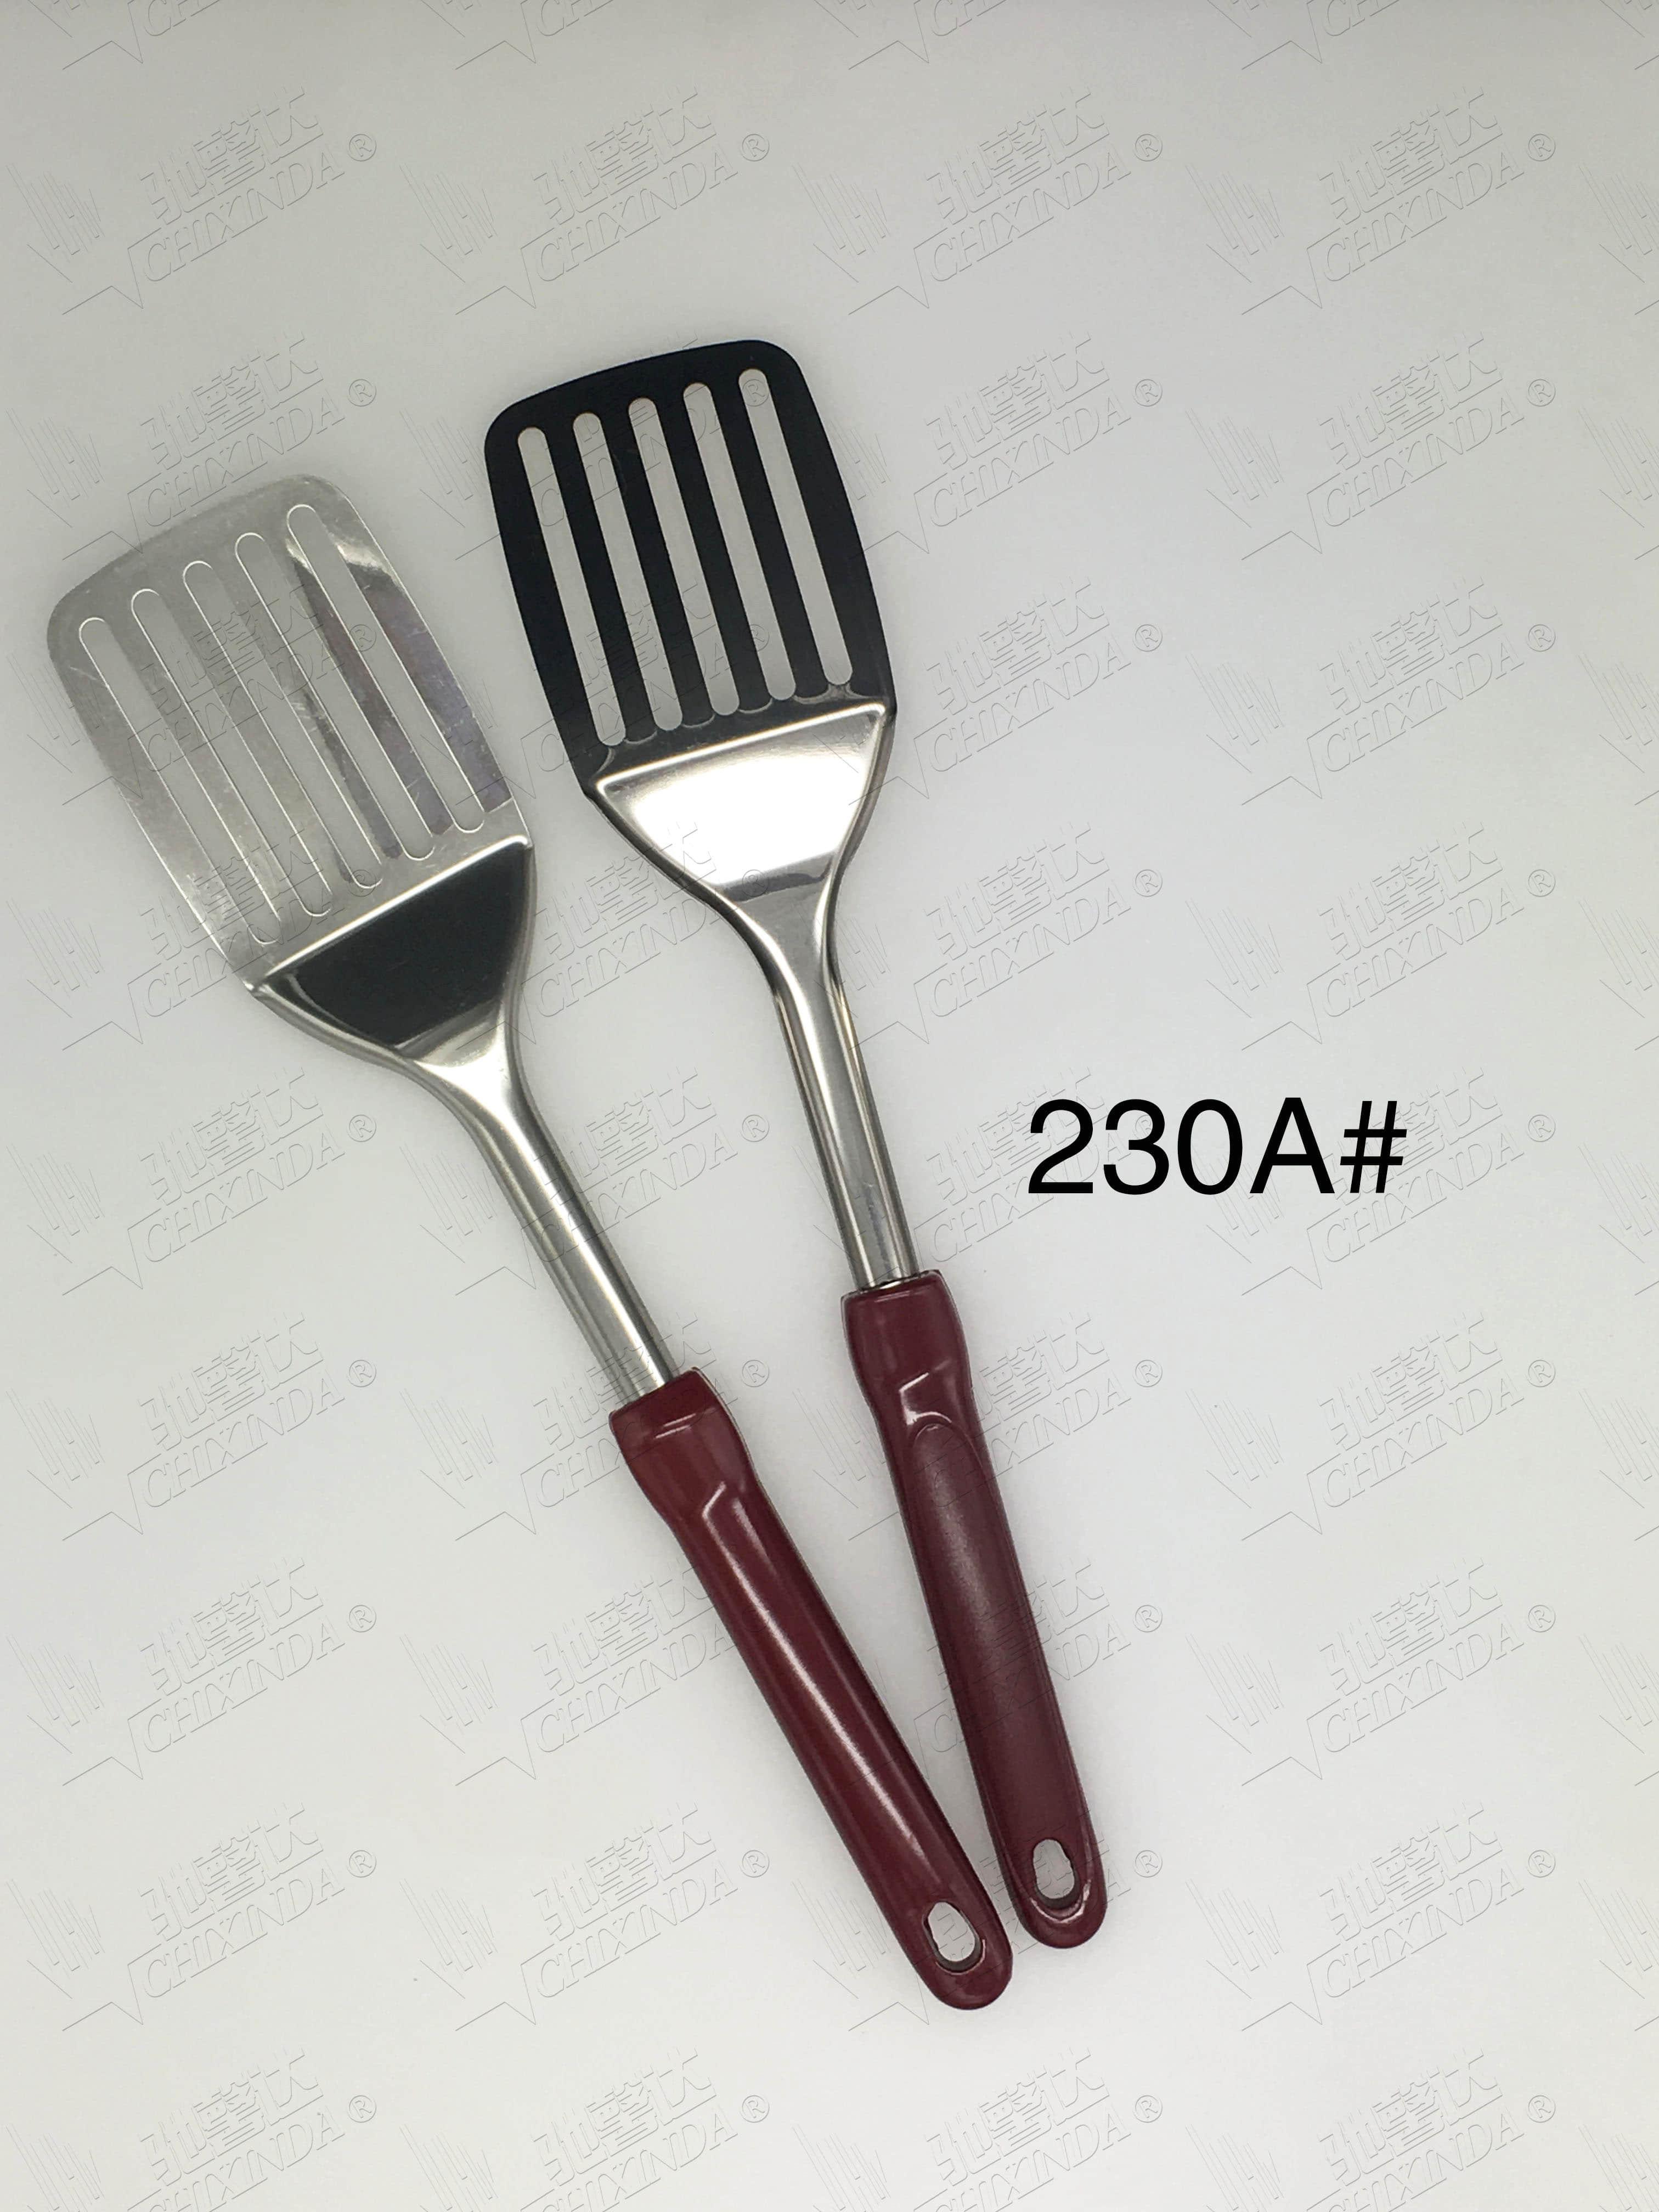 230A#